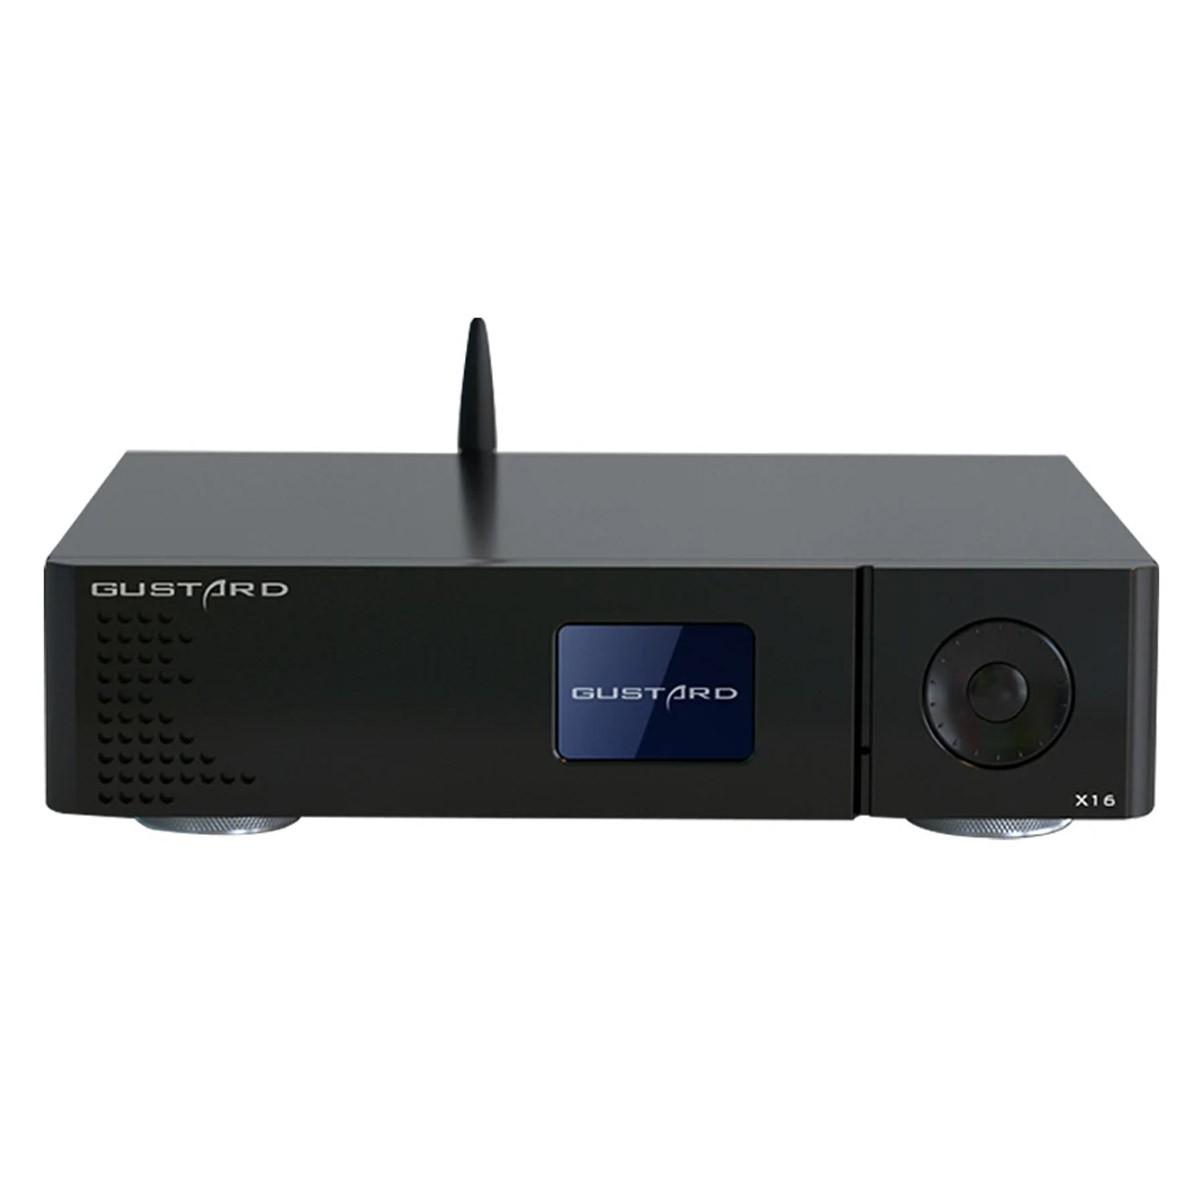 GUSTARD DAC-X16 Balanced DAC 2x ES9068AS Accusilicon XMOS MQA Bluetooth 5.0 32bit 768kHz DSD512